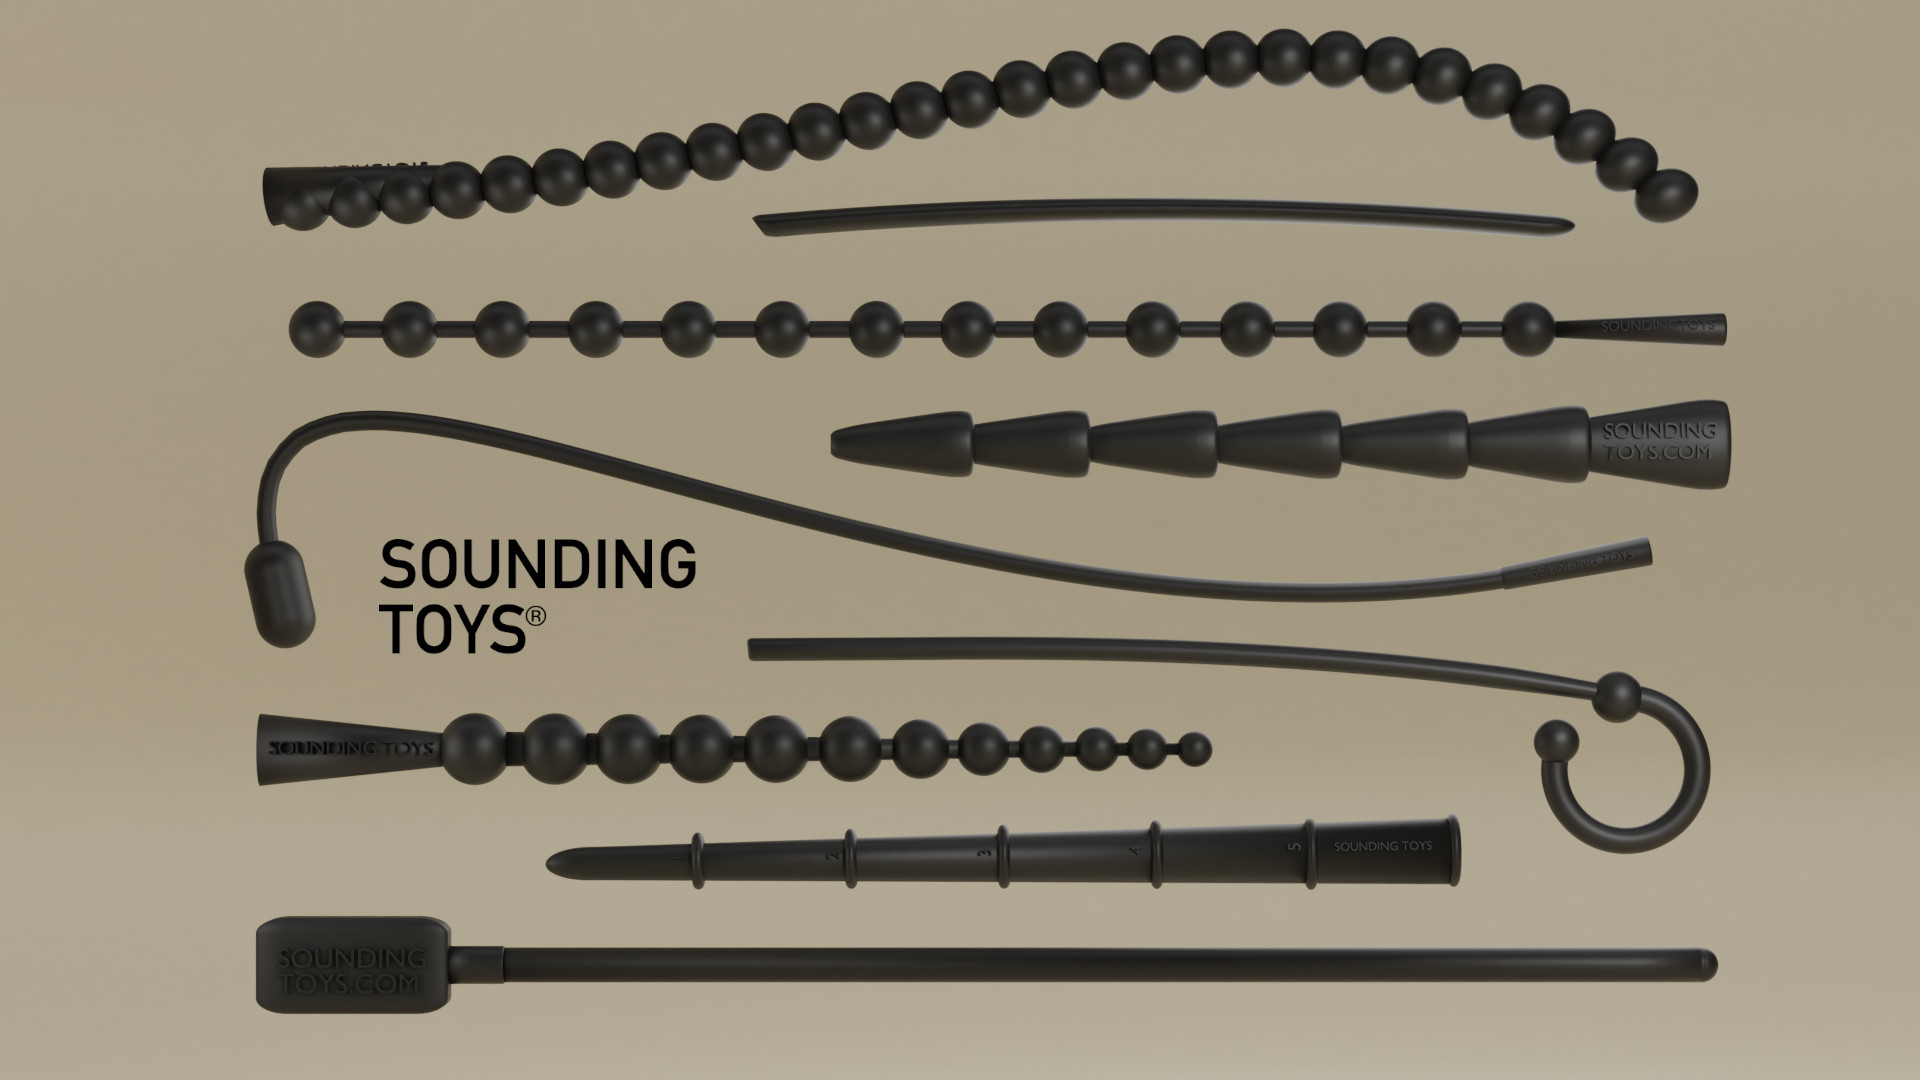 Sounding Toys®